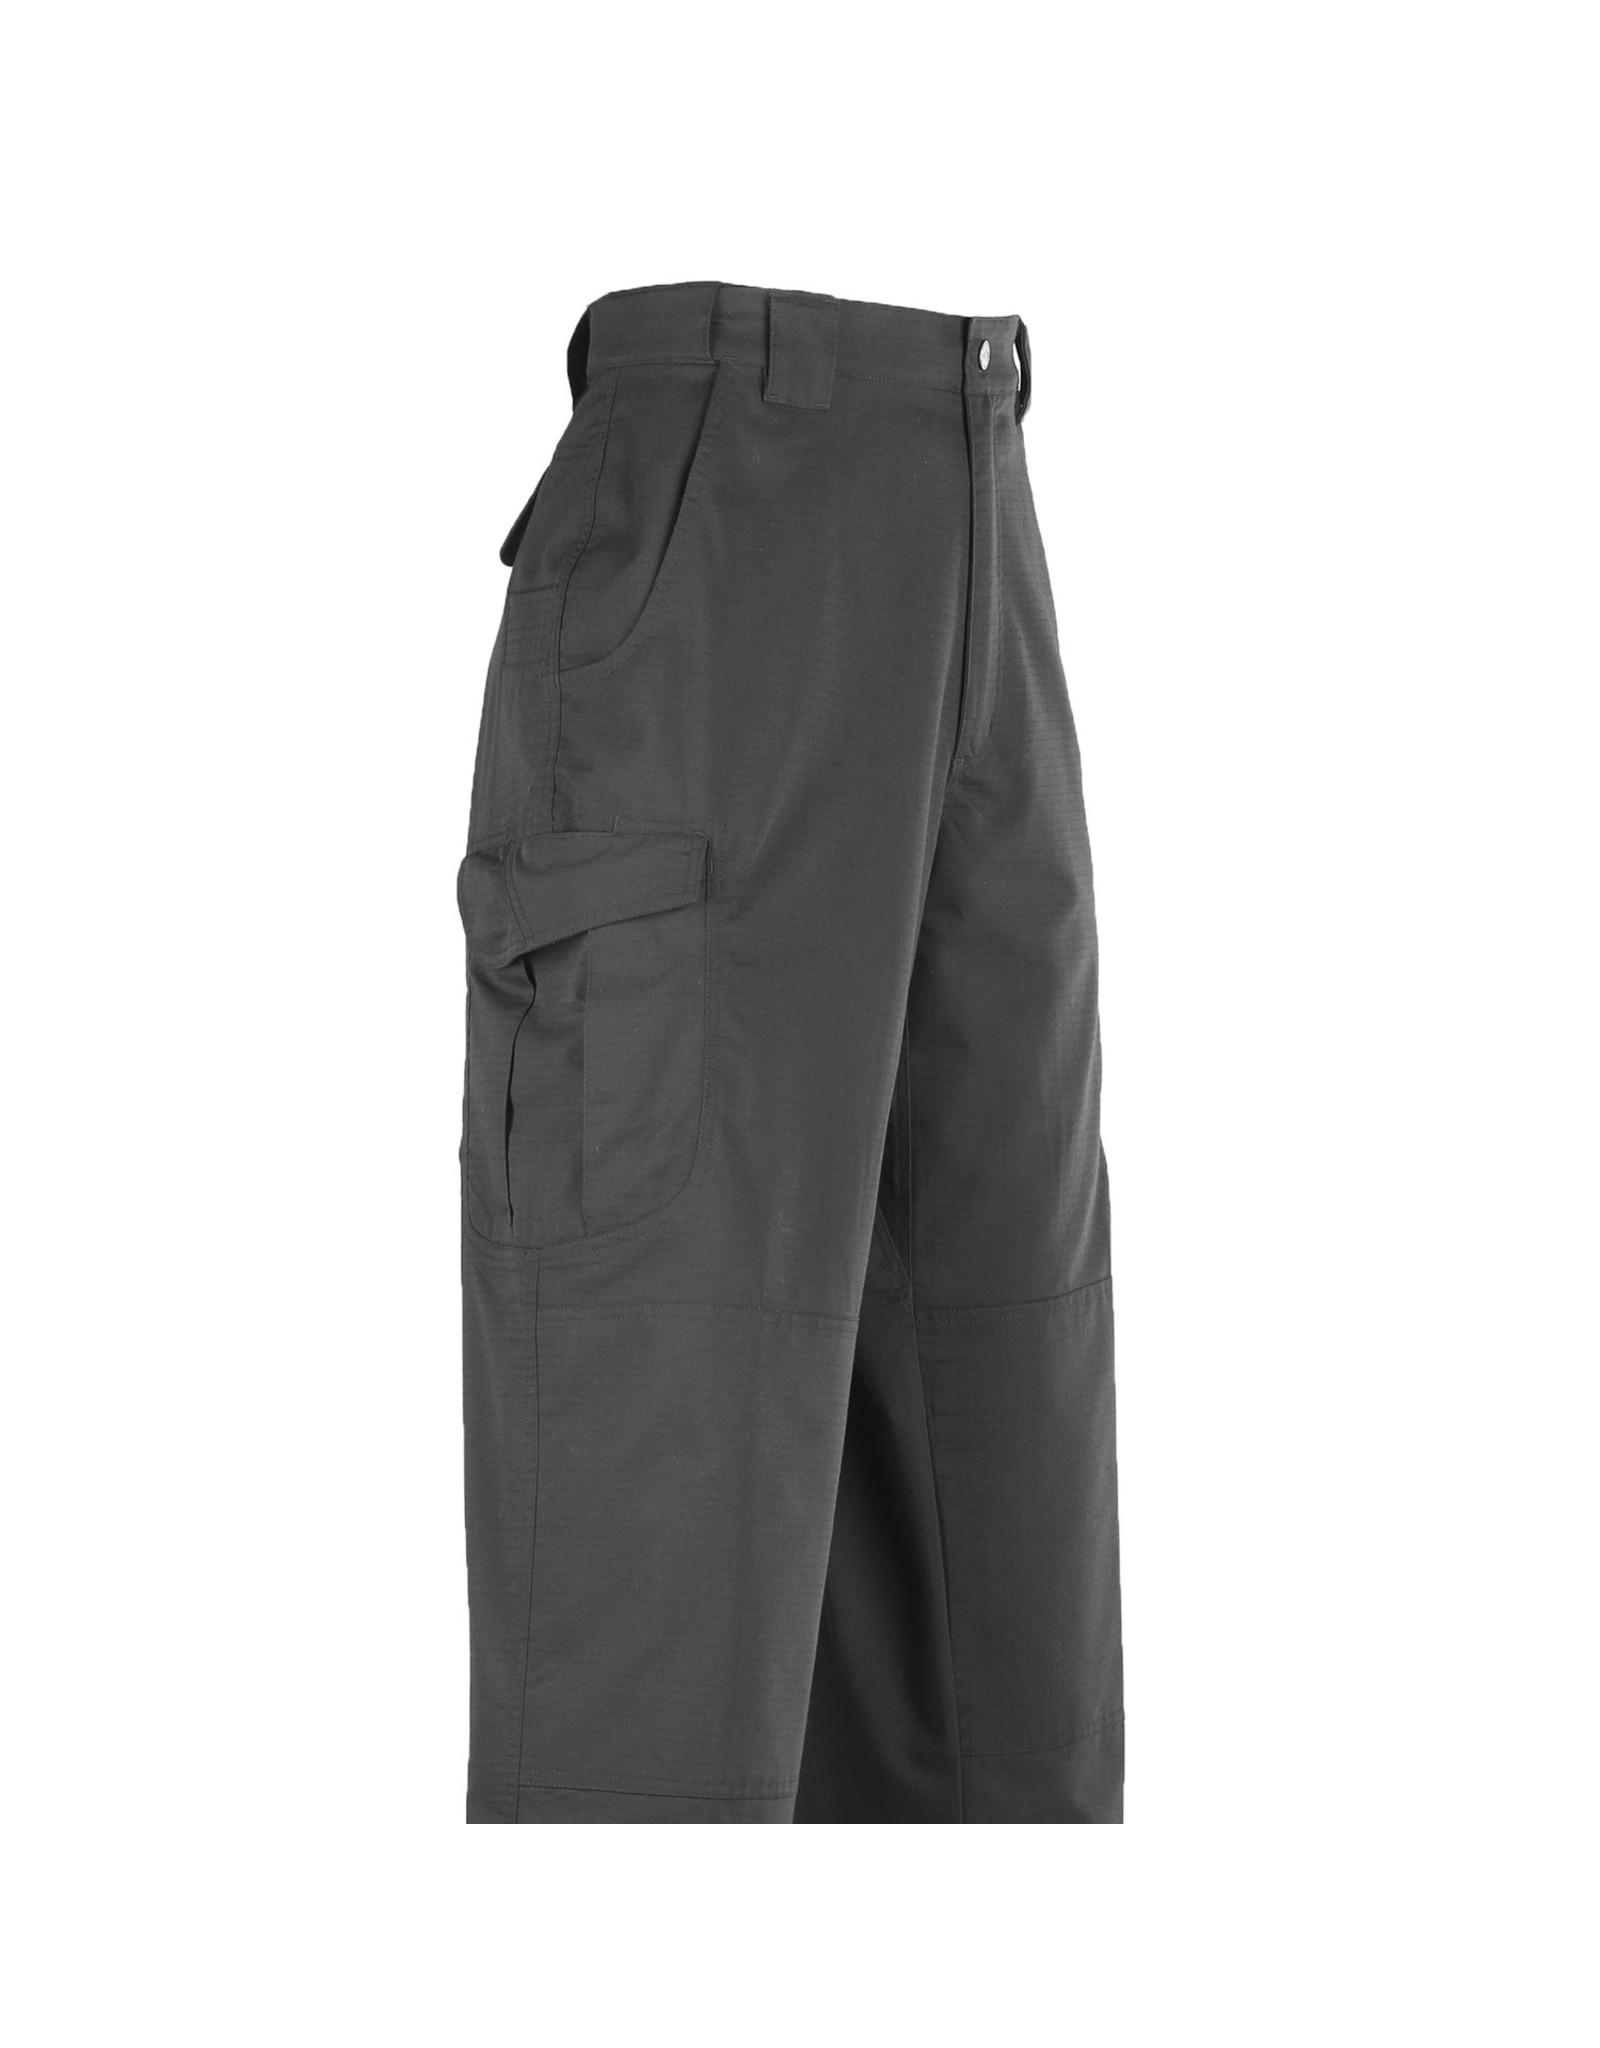 TRU-SPEC Men's 24/7 Ascent pants (30 Inseam)